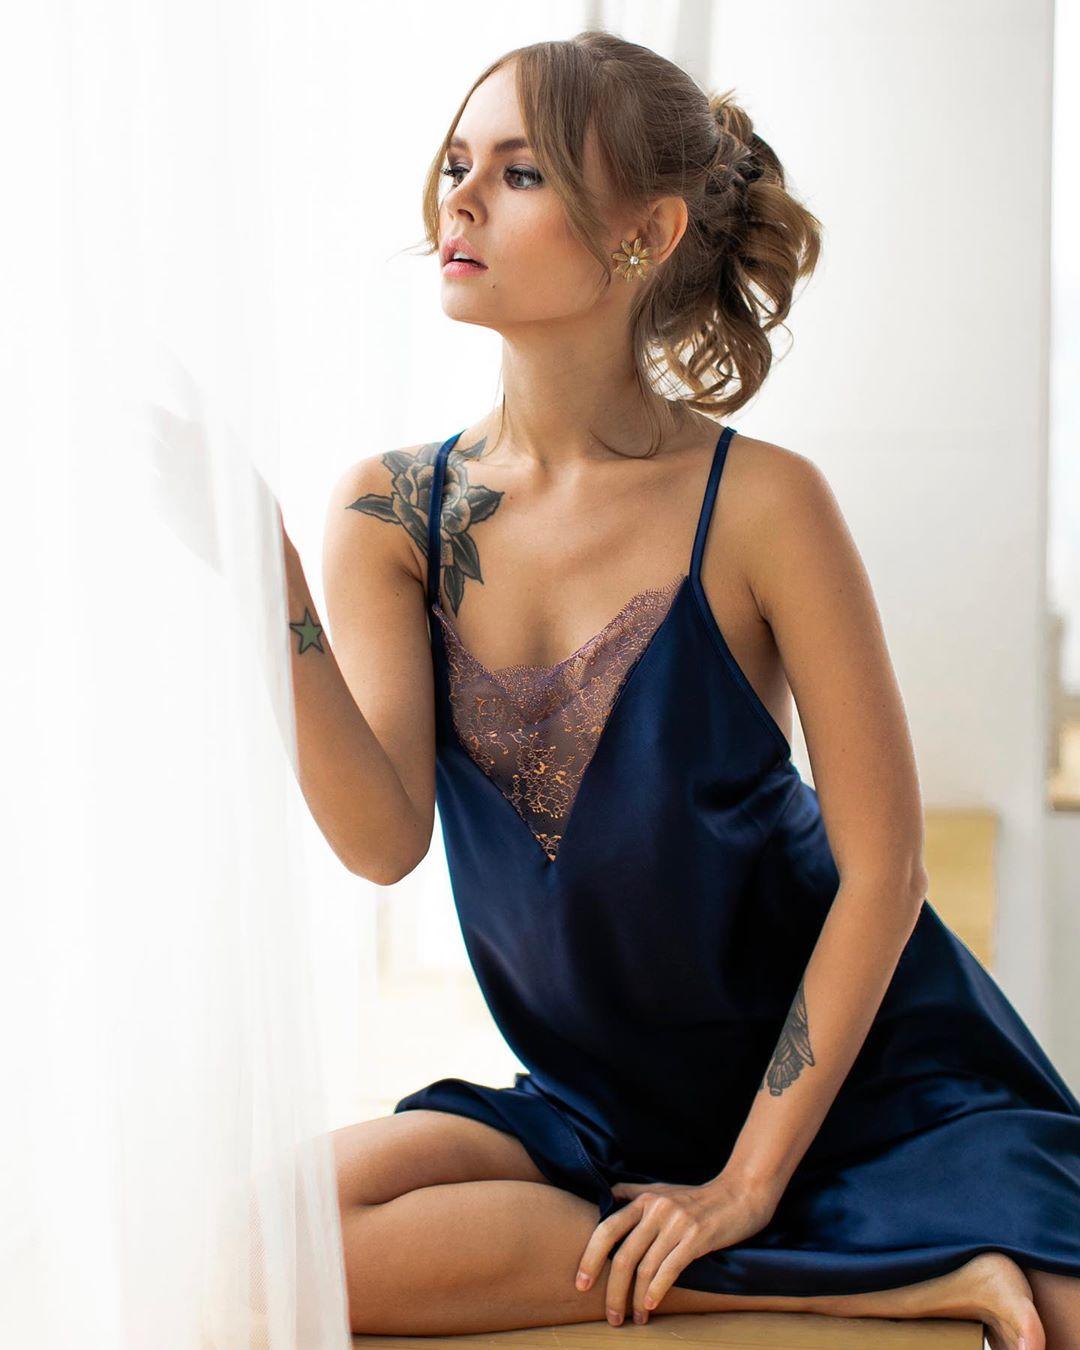 Анастасия Щеглова для Lady's Showroom